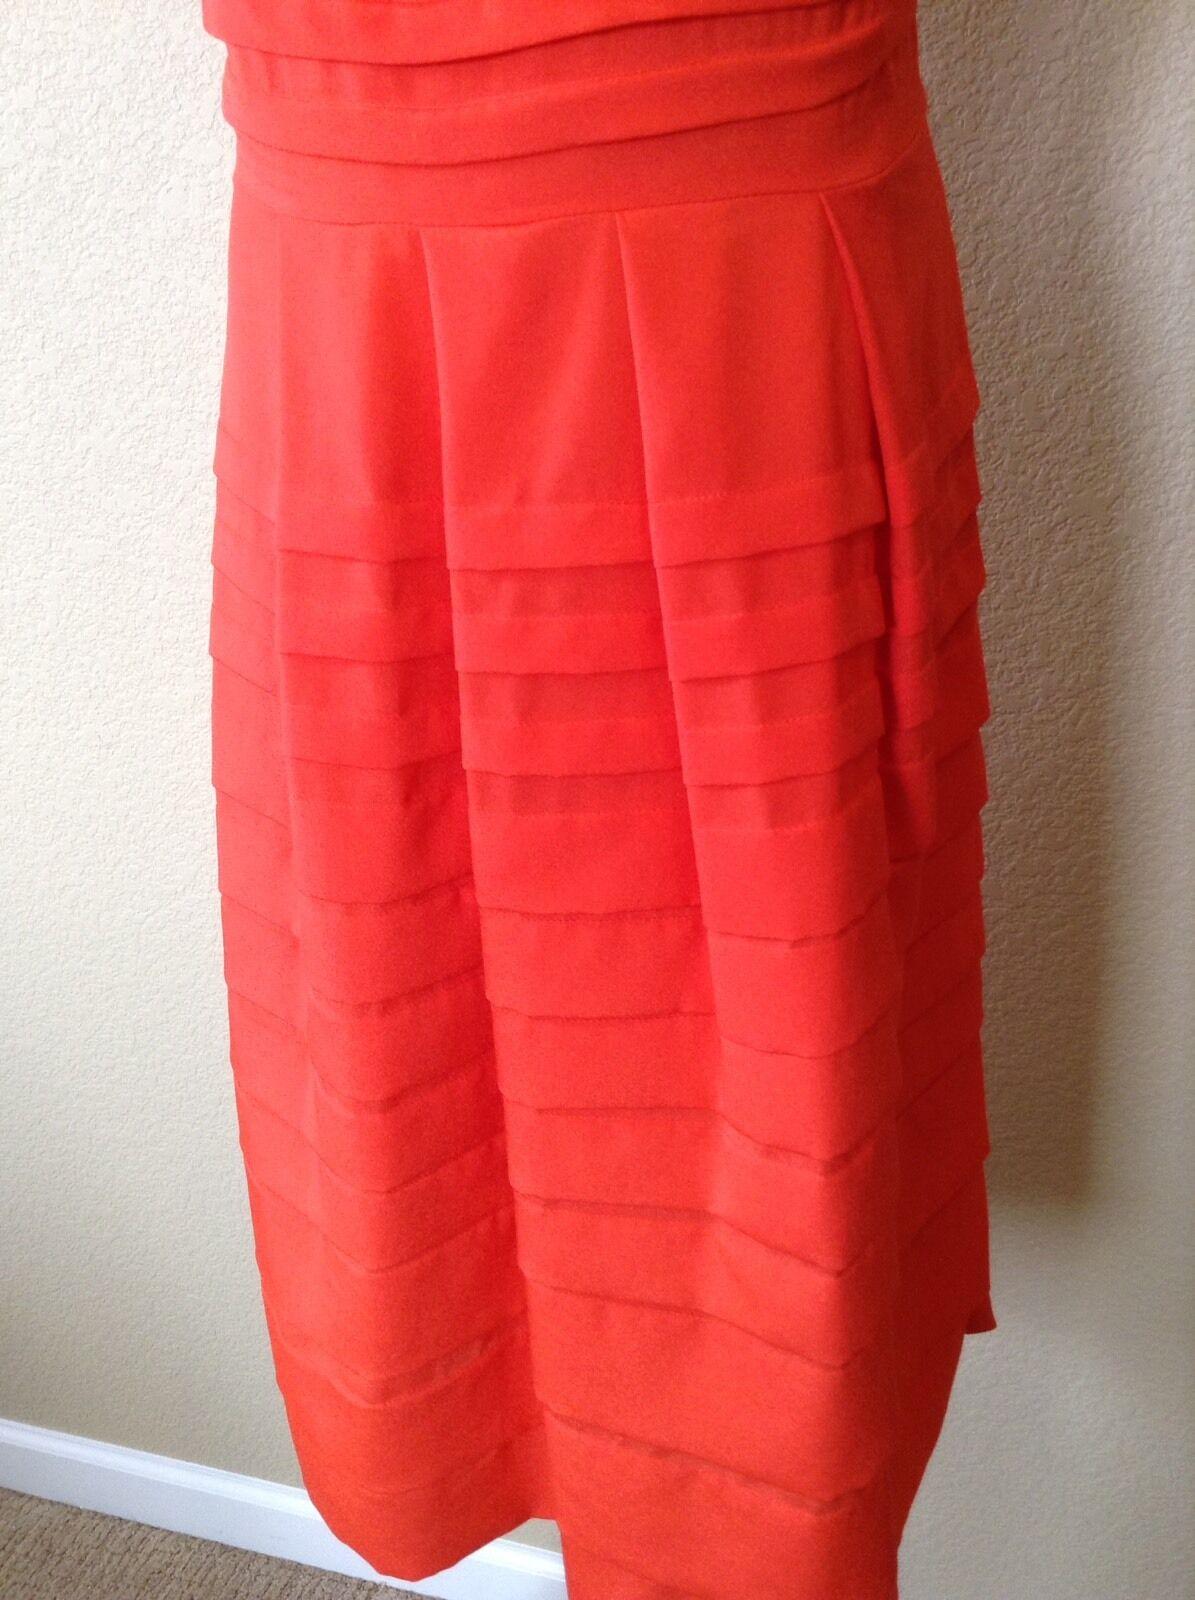 NWT Anthropologie Bright Bright Bright orange Tangelo Dress by Eva Franco, Size 4 3a2986